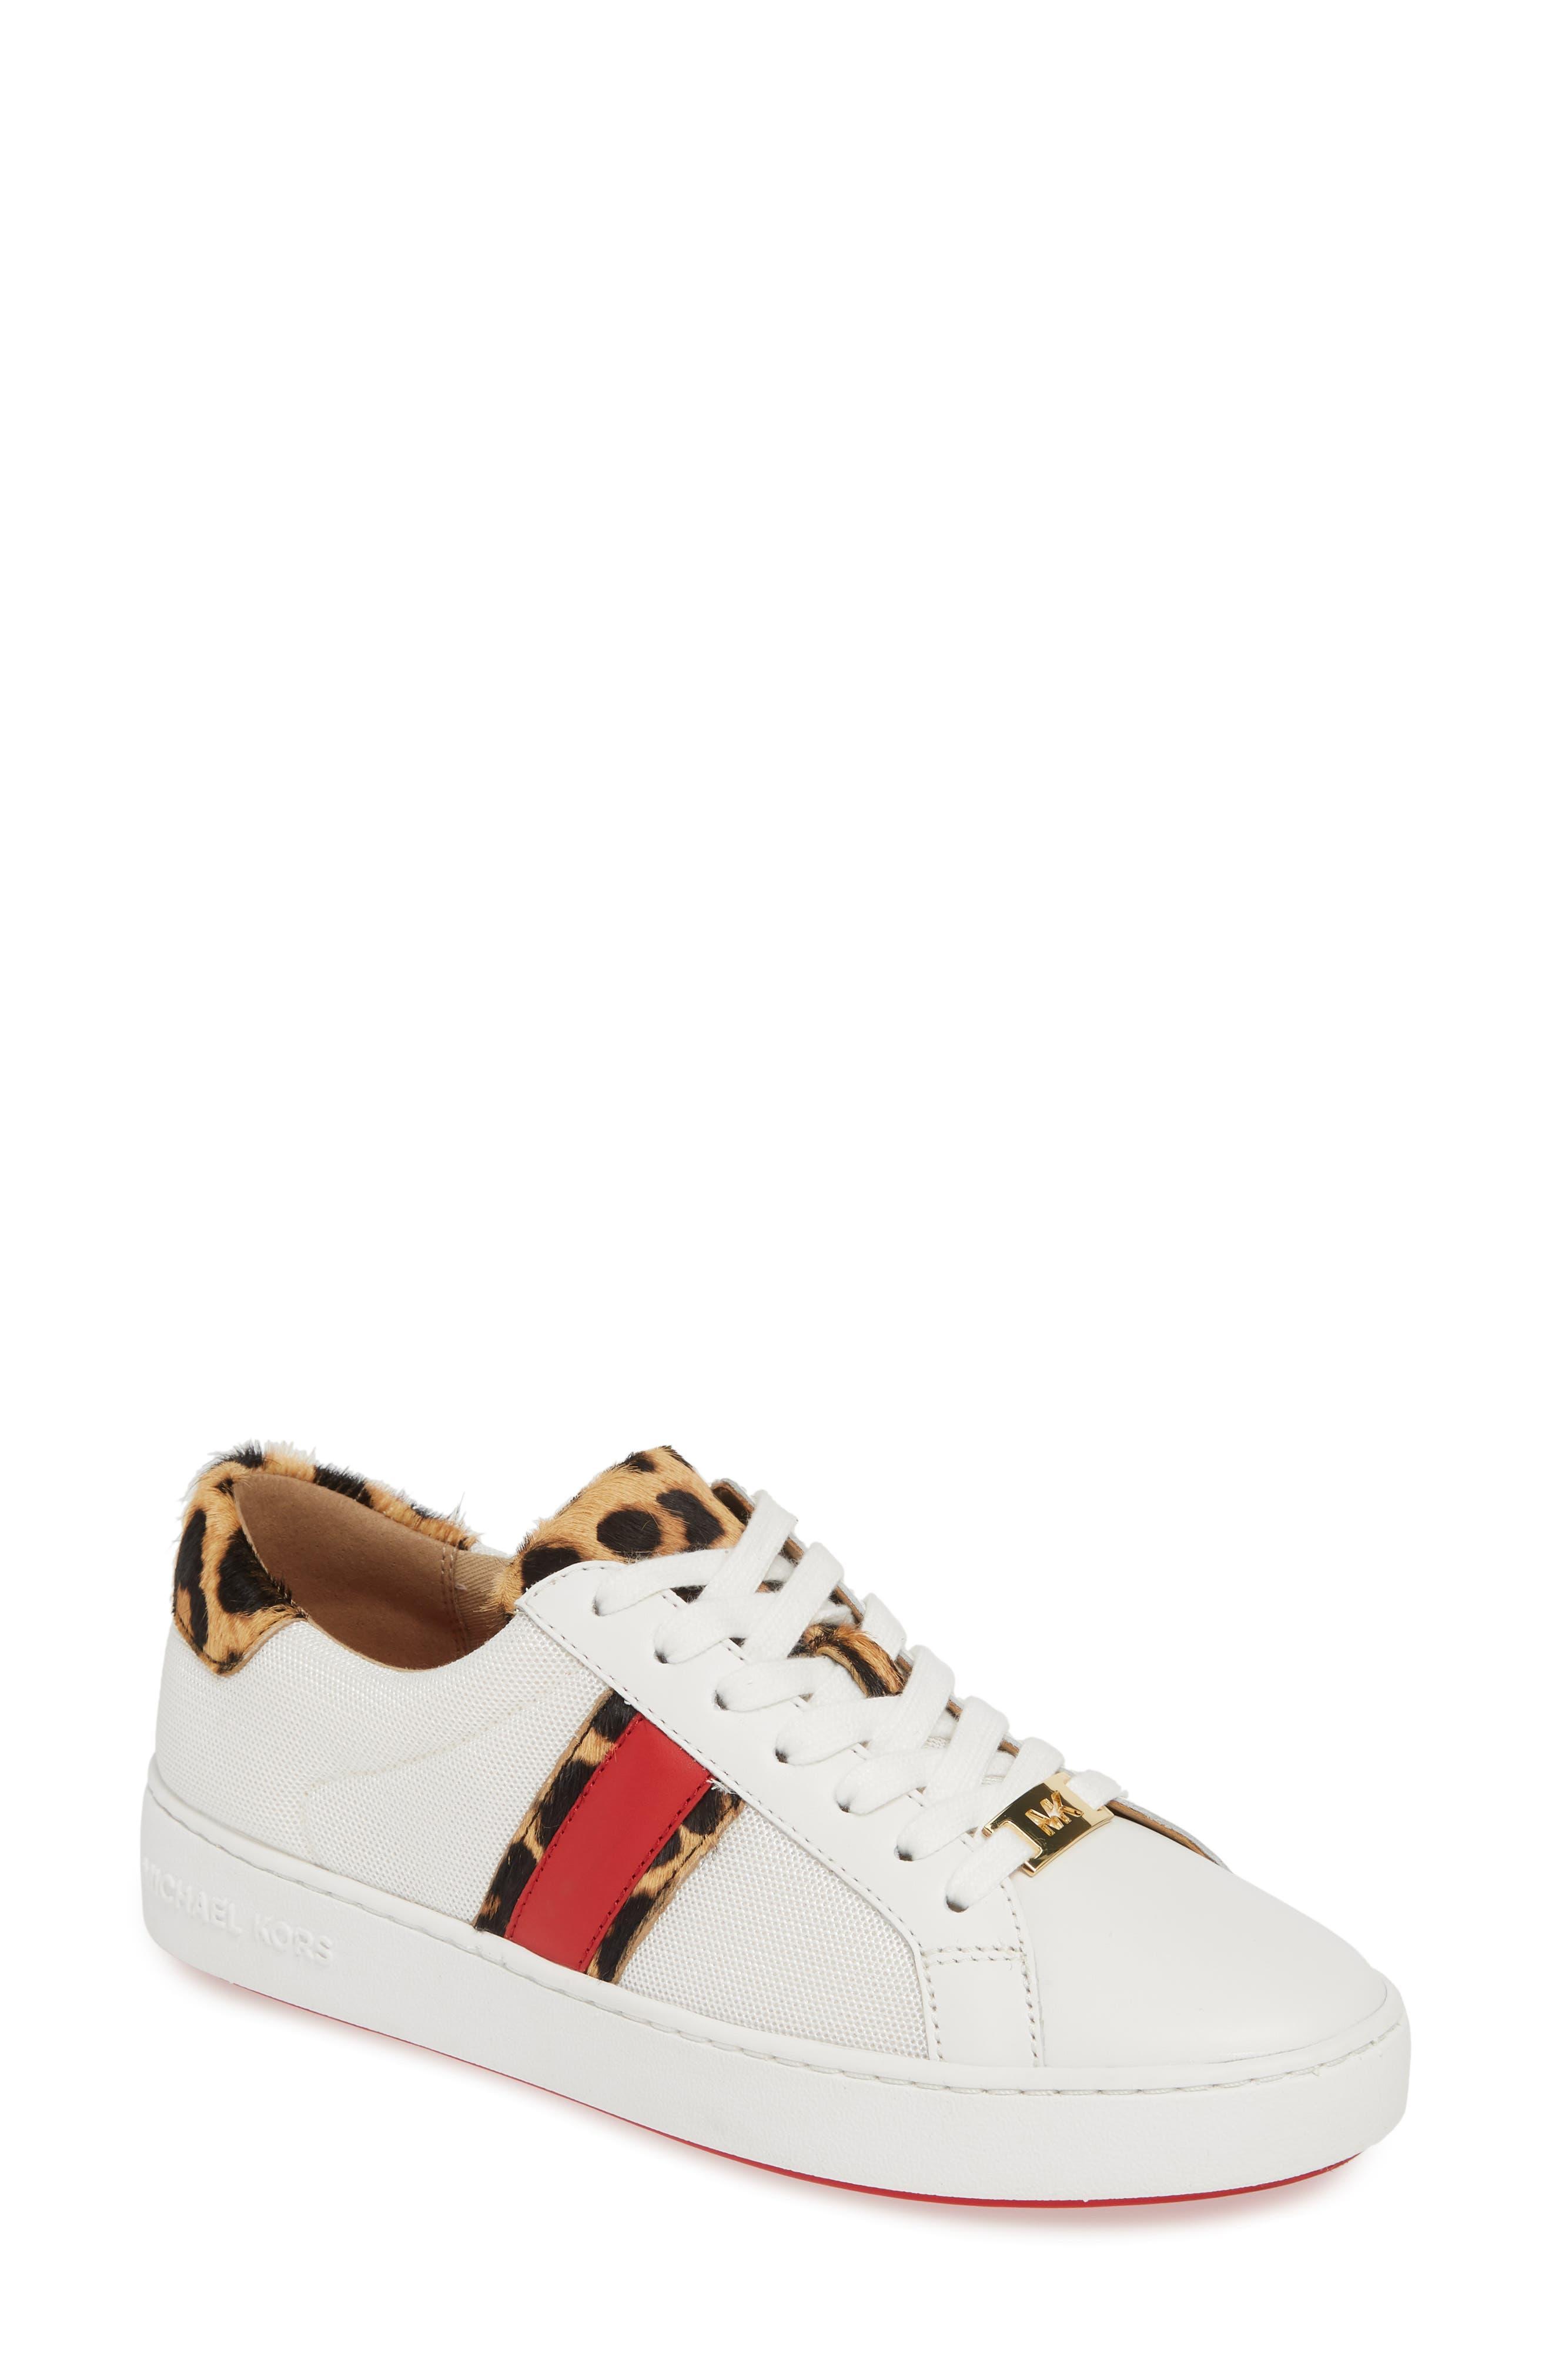 MICHAEL MICHAEL KORS, Irving Stripe Sneaker, Main thumbnail 1, color, OPTIC WHITE/ NATURAL